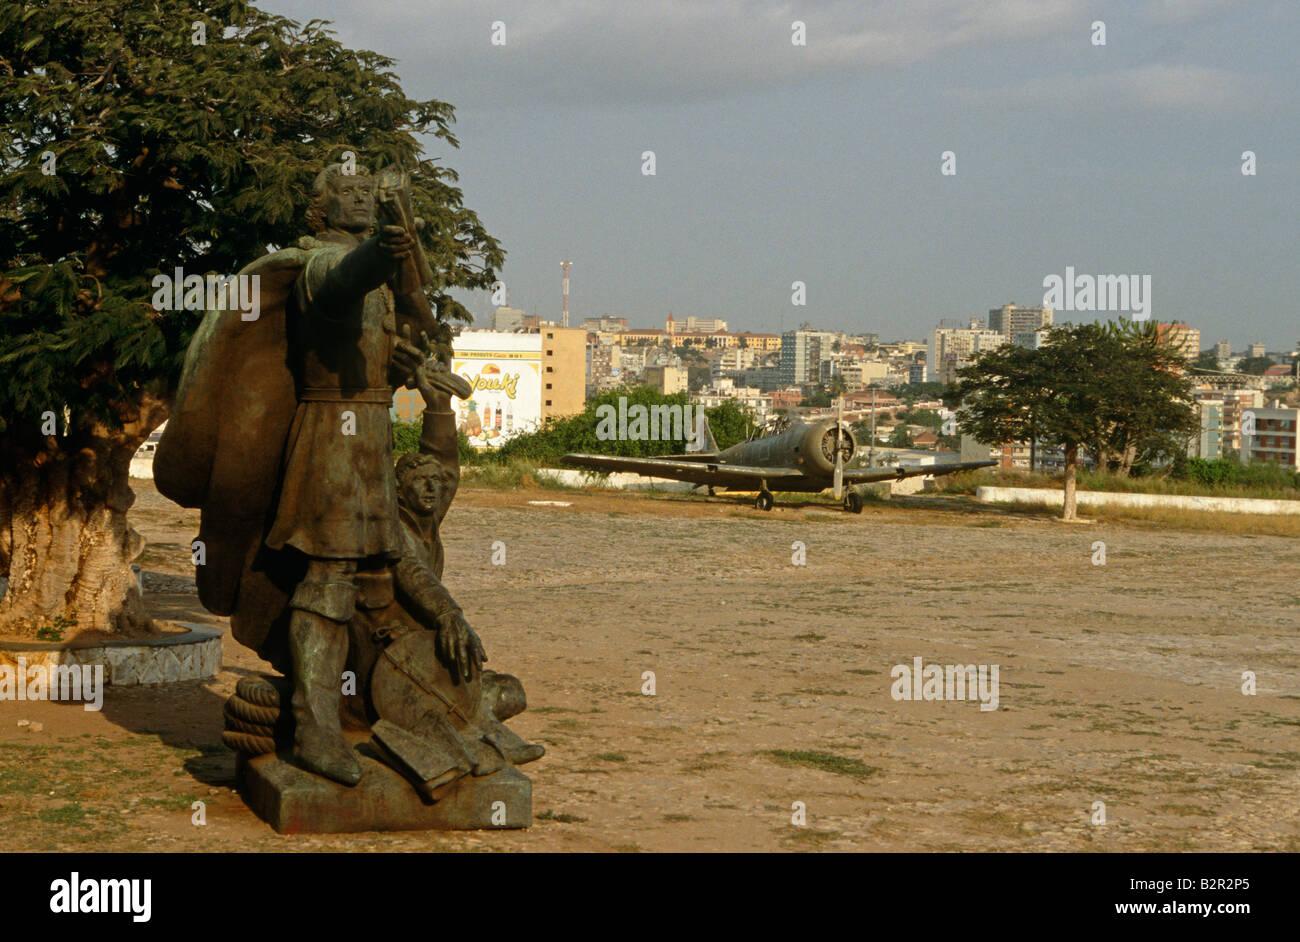 Old statue, Luanda, Angola - Stock Image